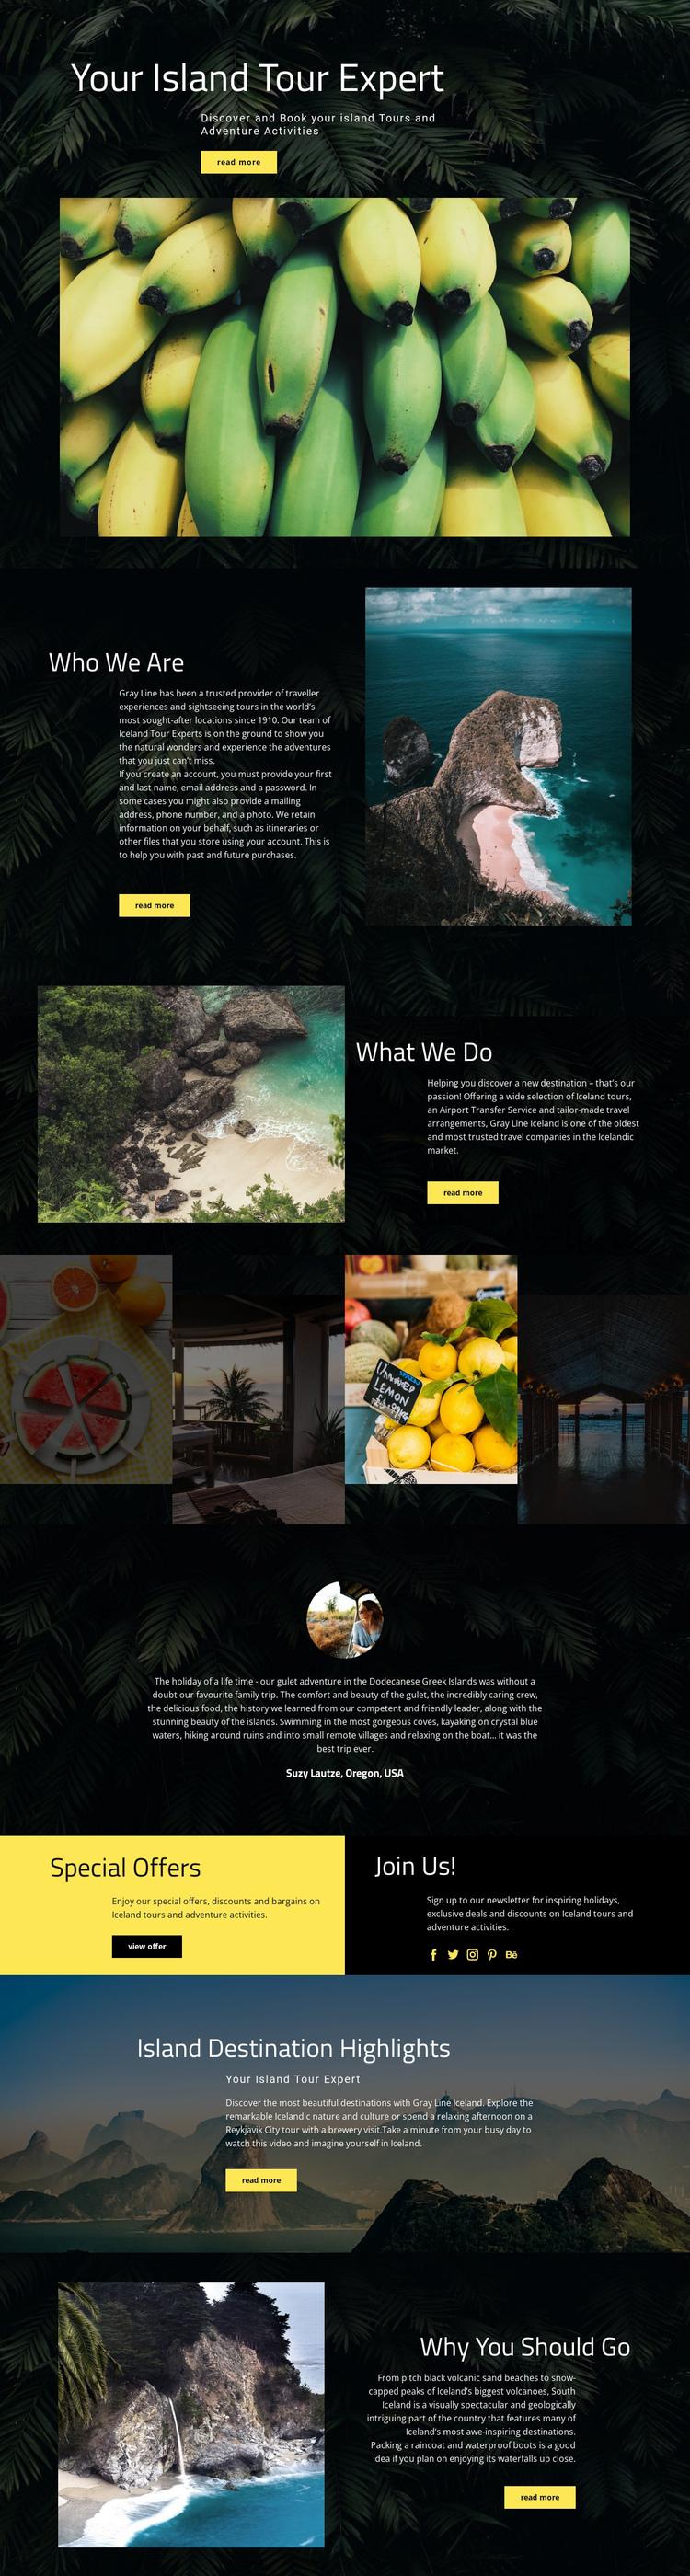 Island Travel Website Builder Software